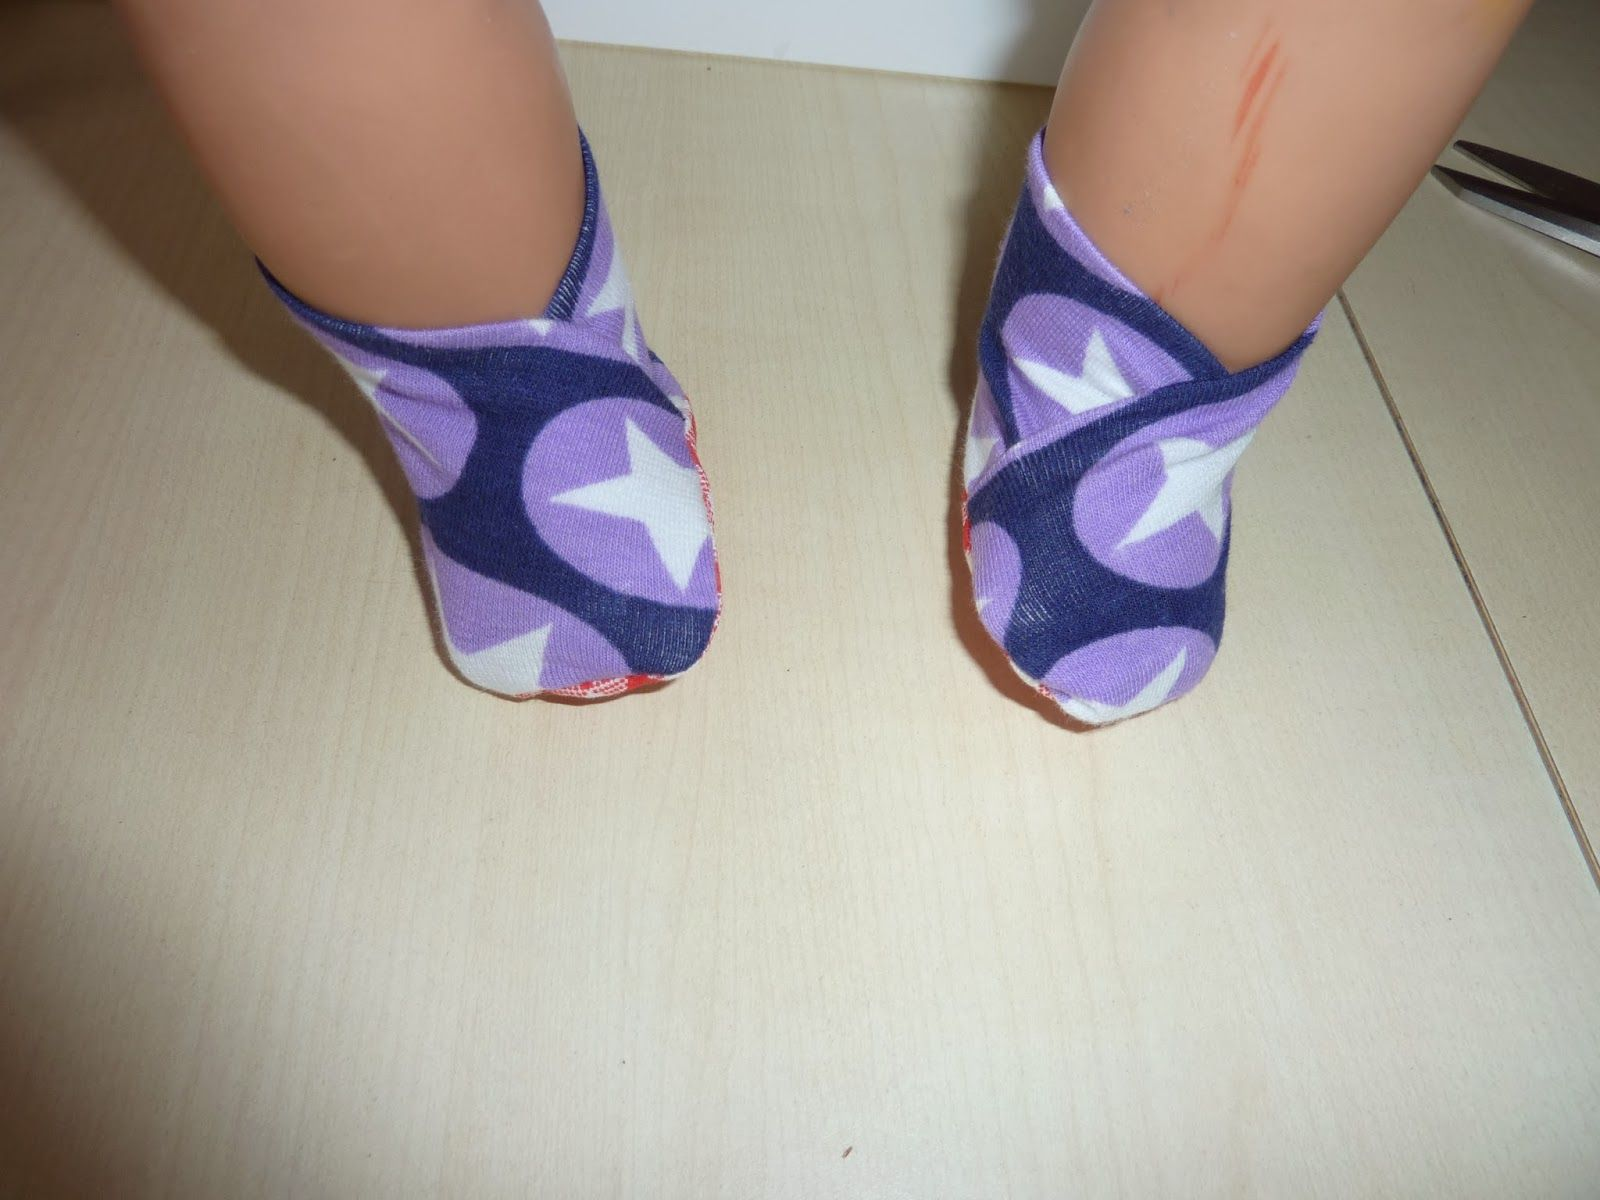 Miniatur-Designe: Anleitung Puppen Socken selber nähen! | Nähen und ...